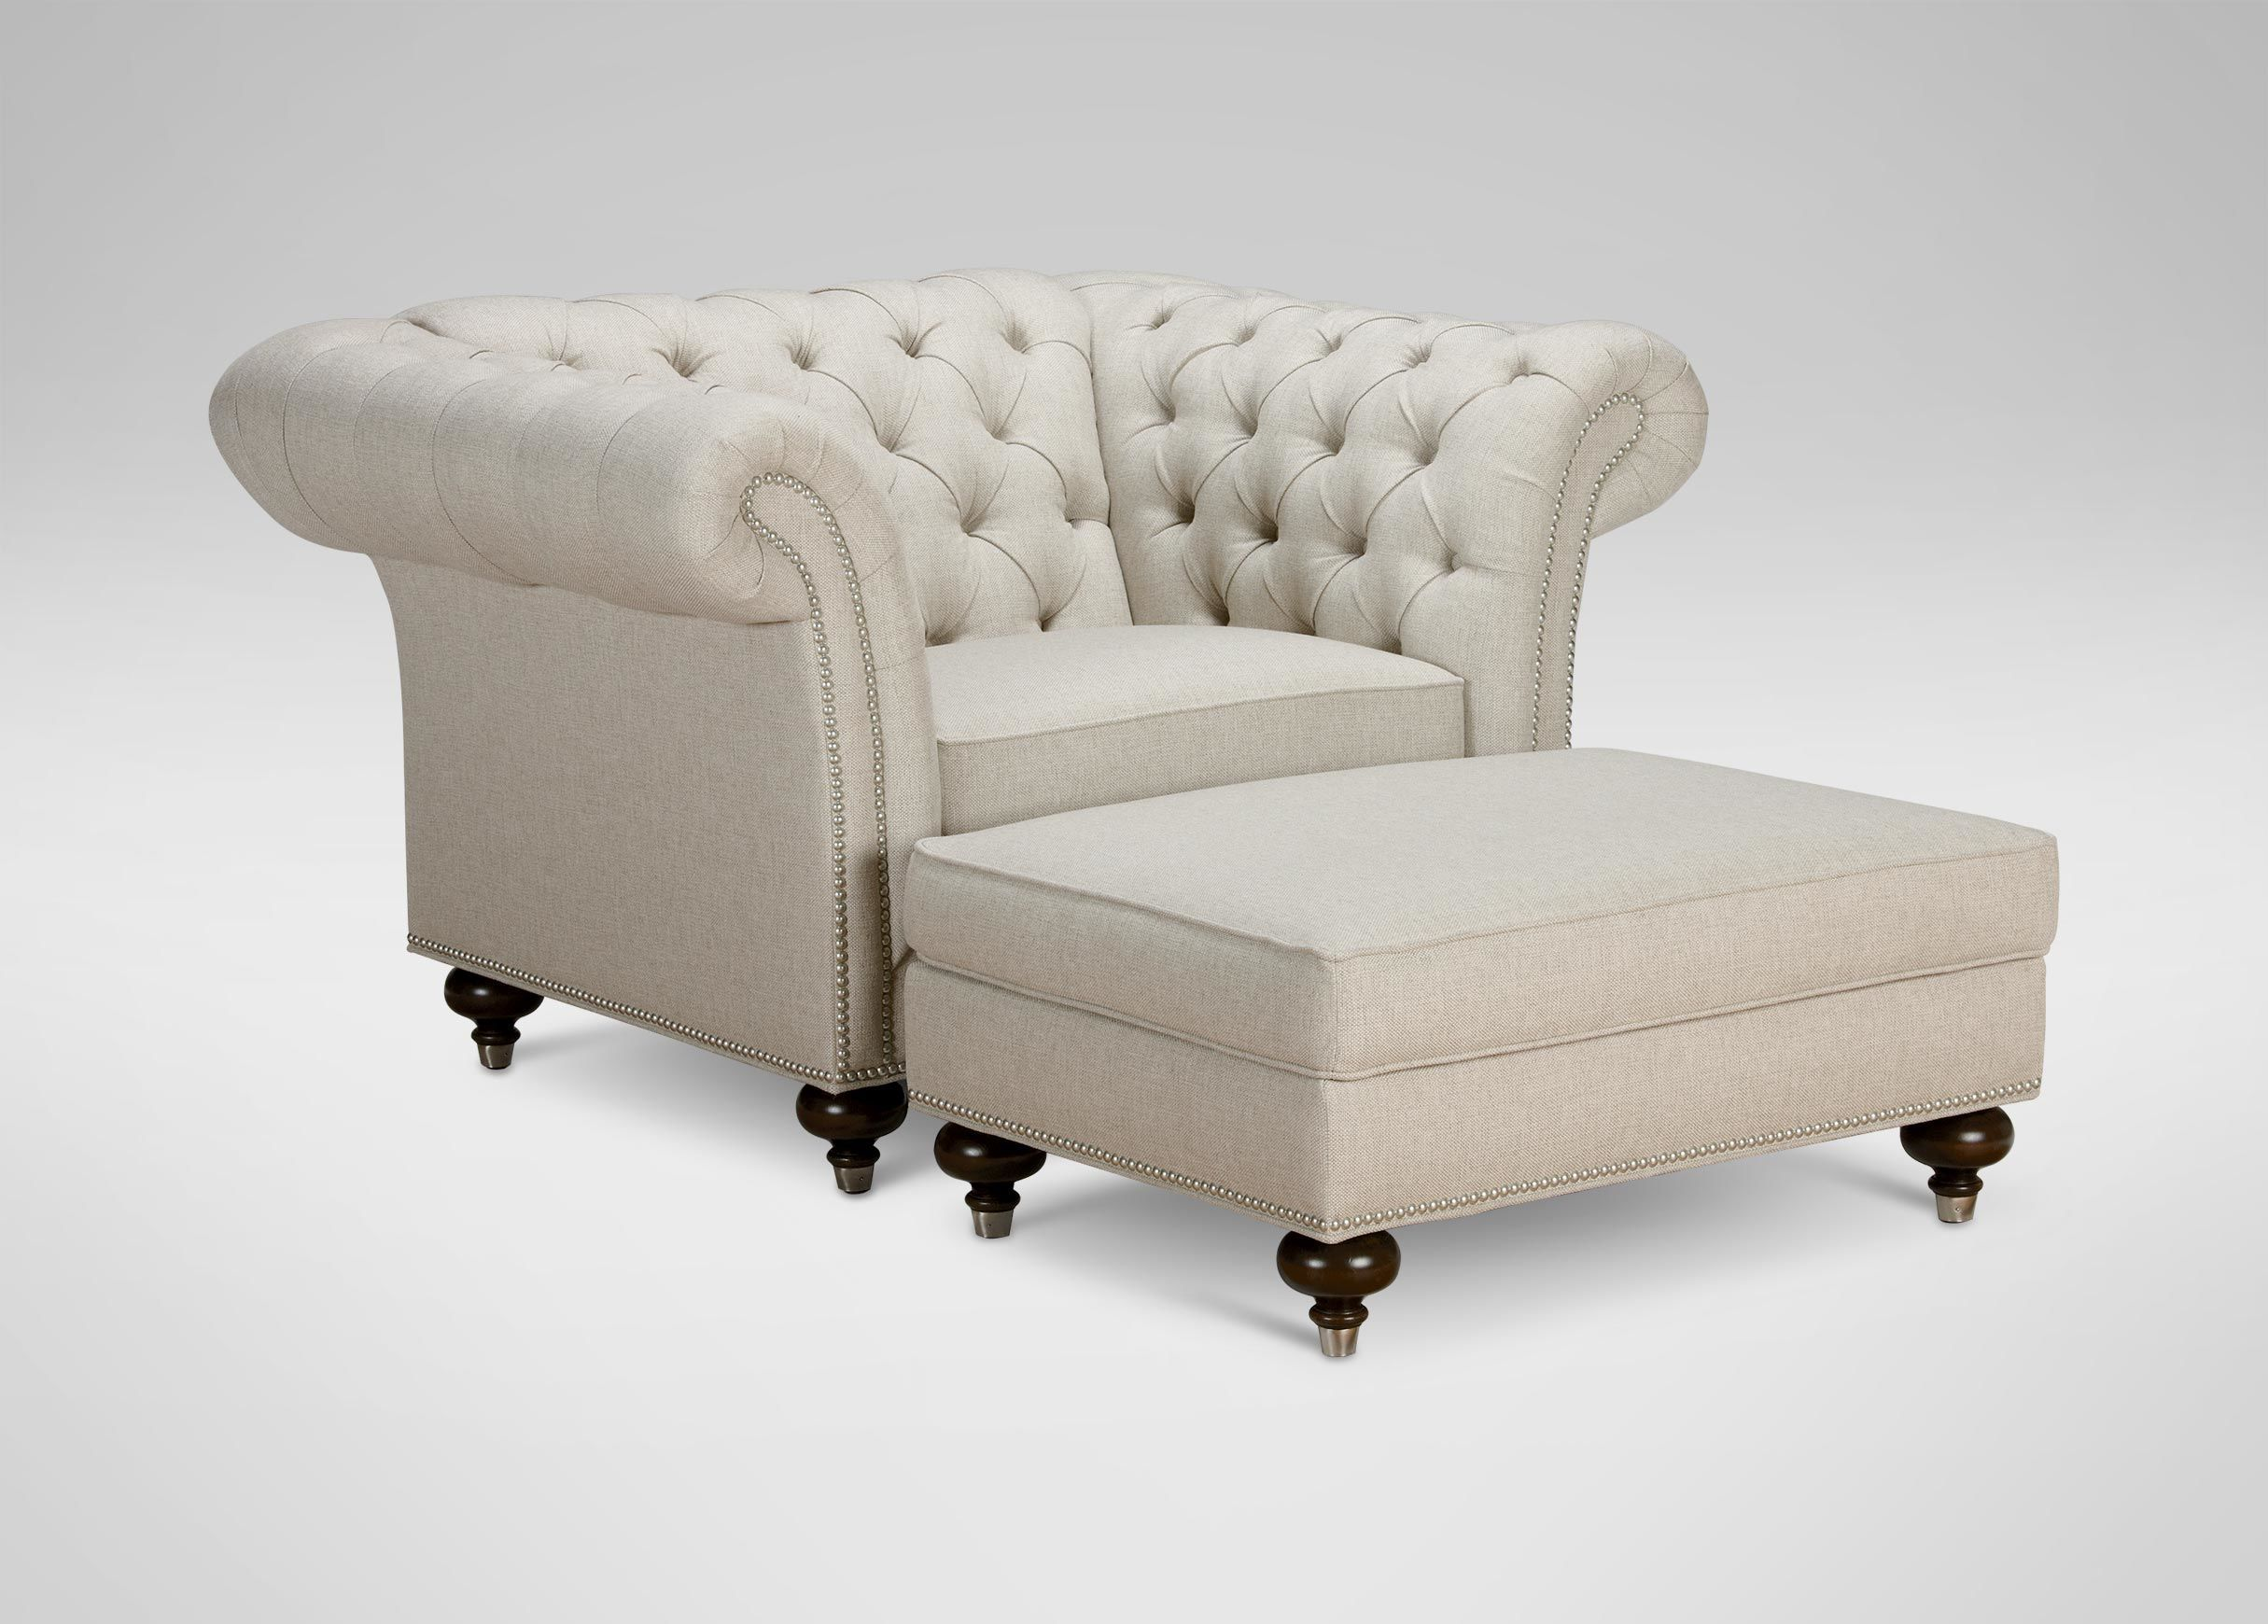 Sofa Covers Chester Koltuk ve Antik Beyaz Tu la